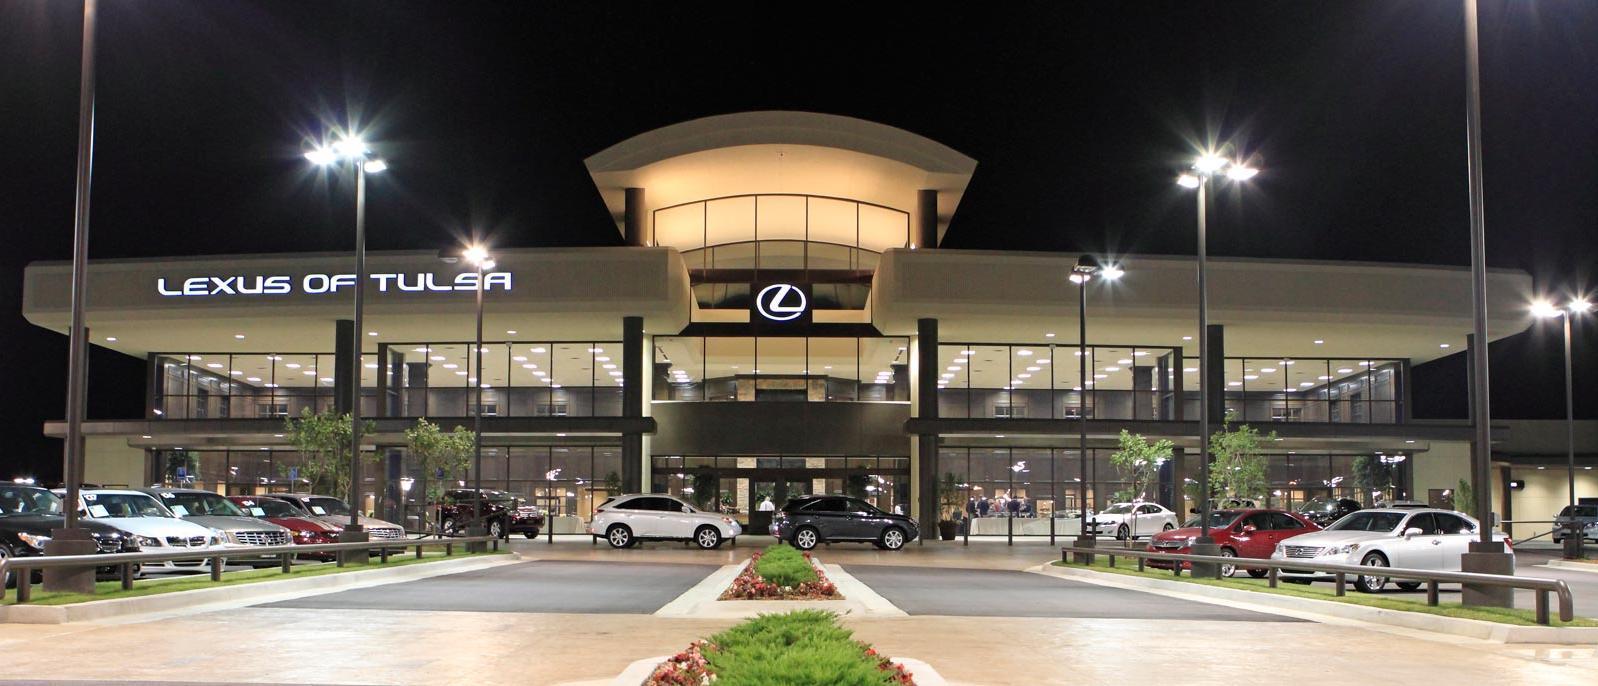 Car Dealerships In Tulsa >> Tulsa Lexus Of Tulsa New Used Lexus Cars